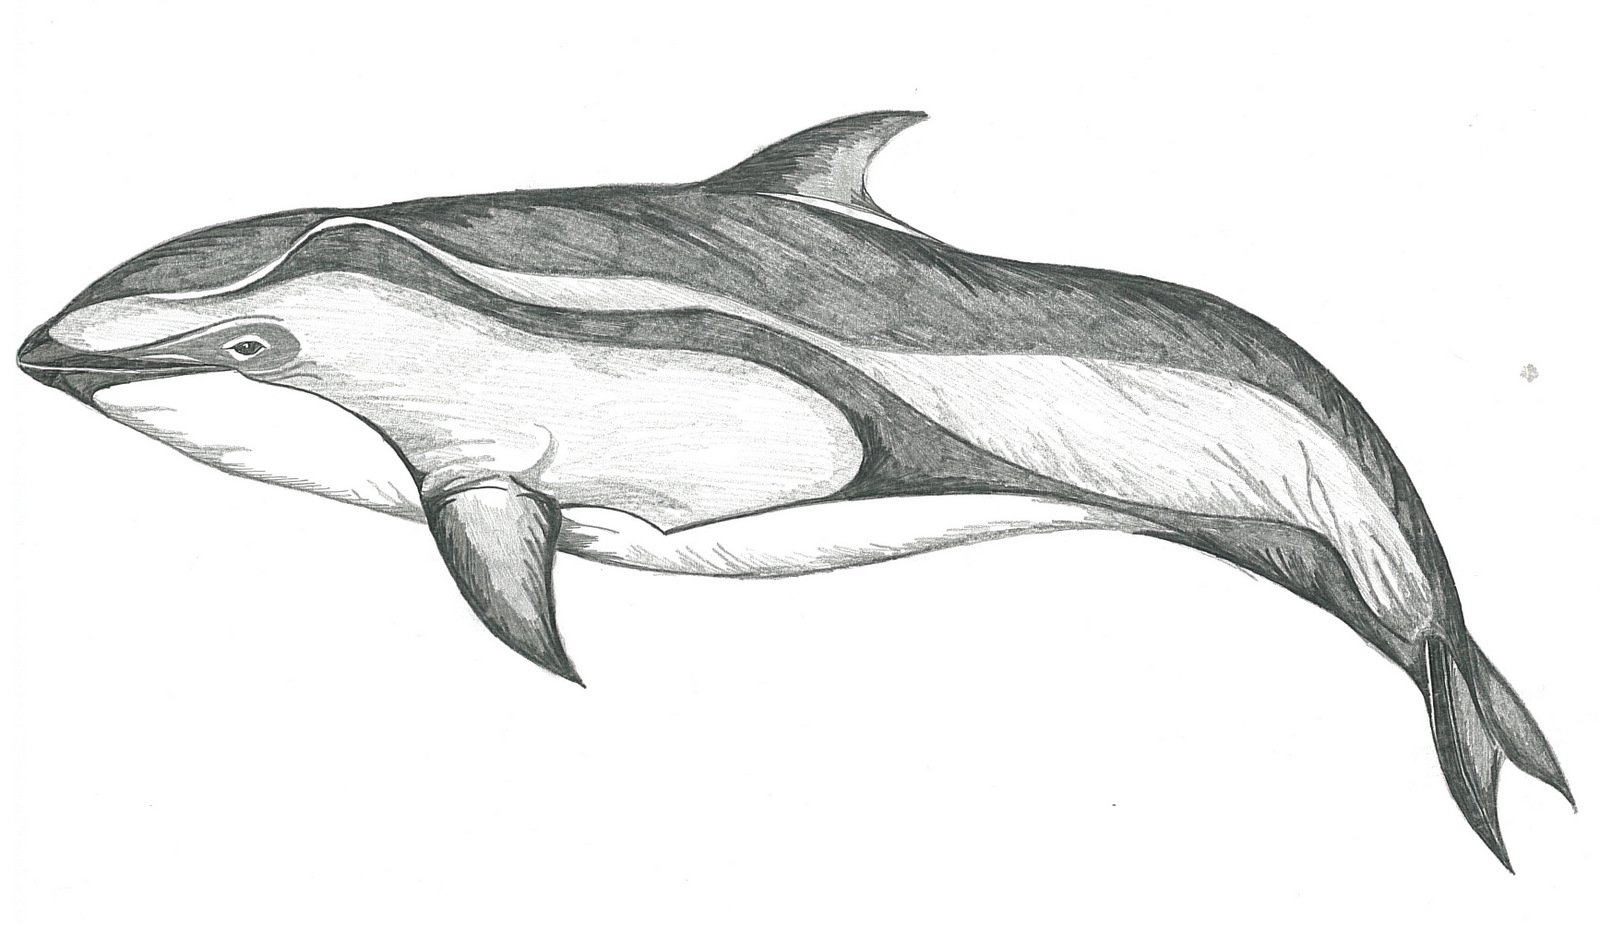 цифру рисунки с дельфинами карандашом книги заранее, прихода